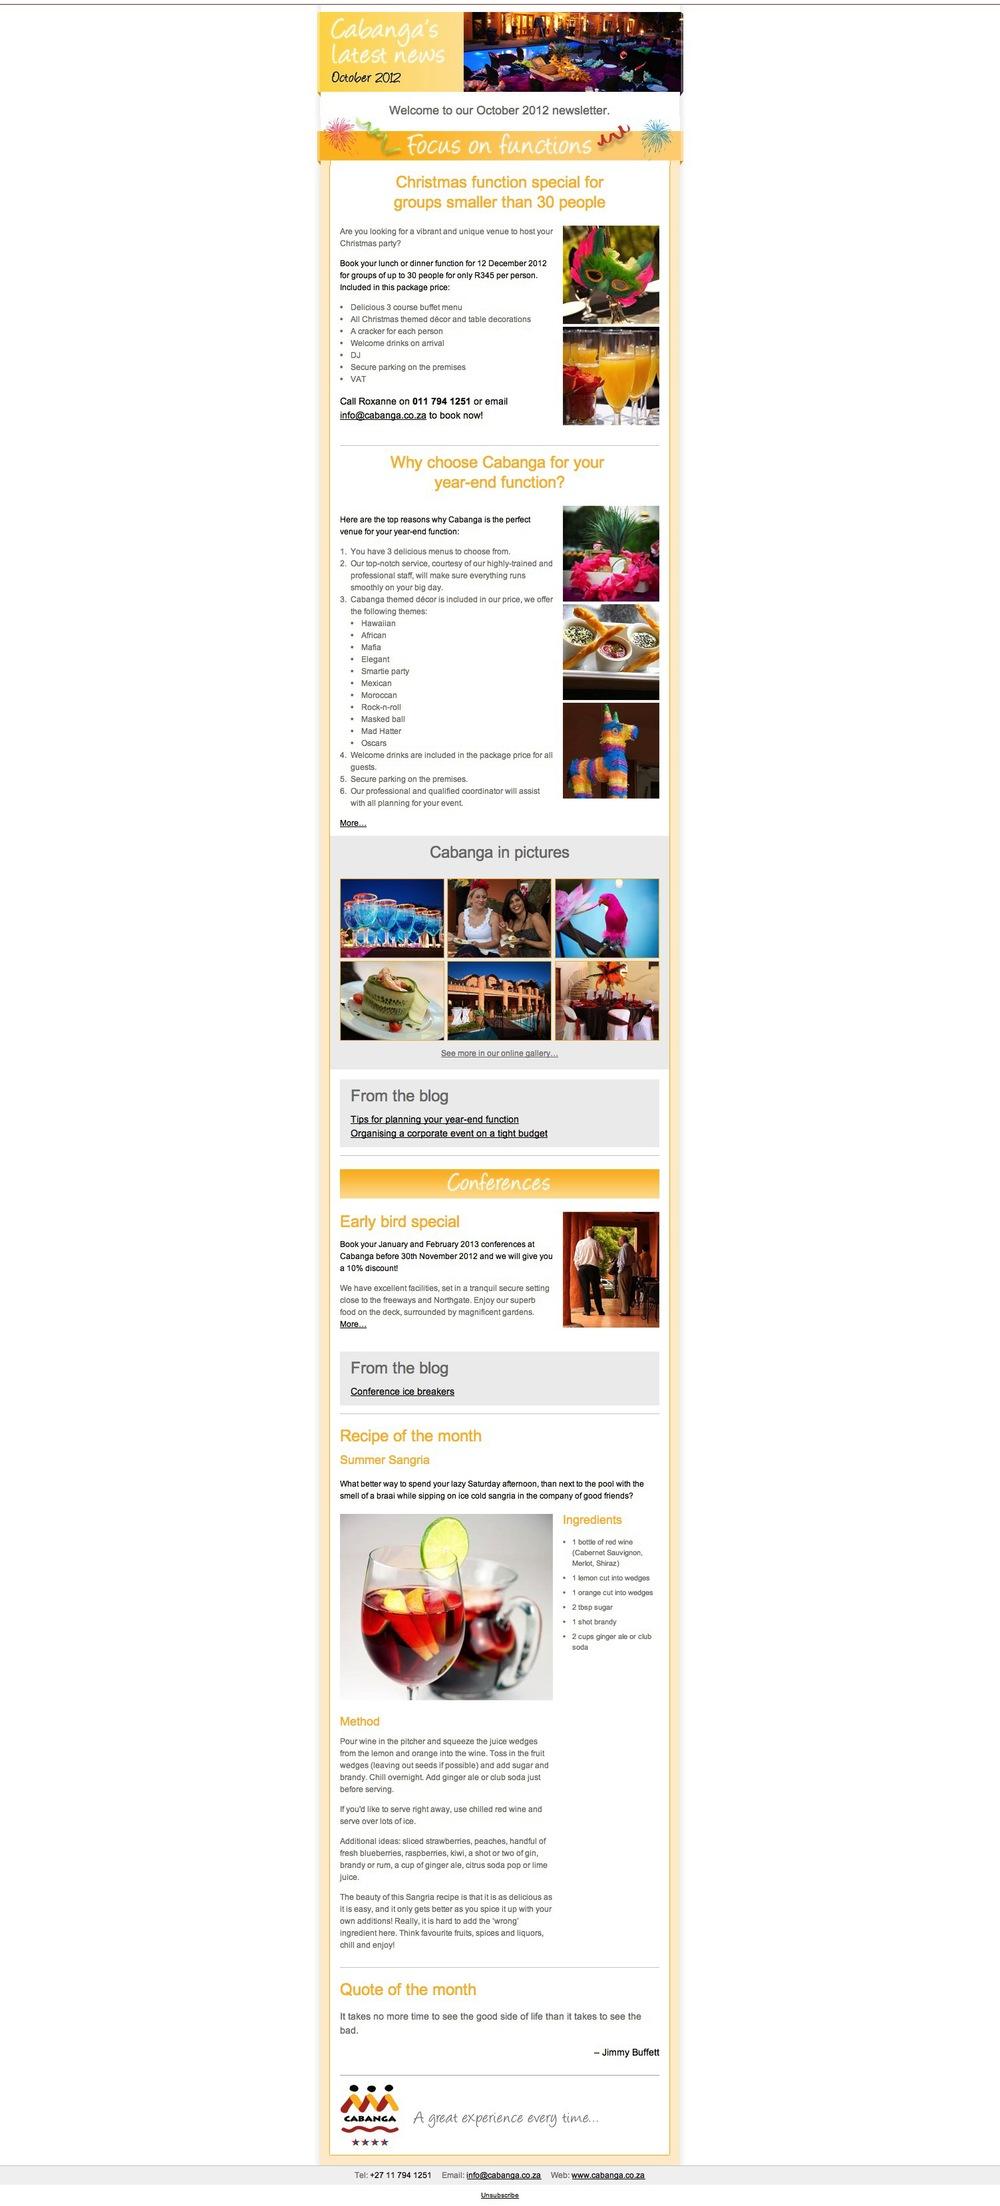 Cabanga's latest news | October 2012.jpg